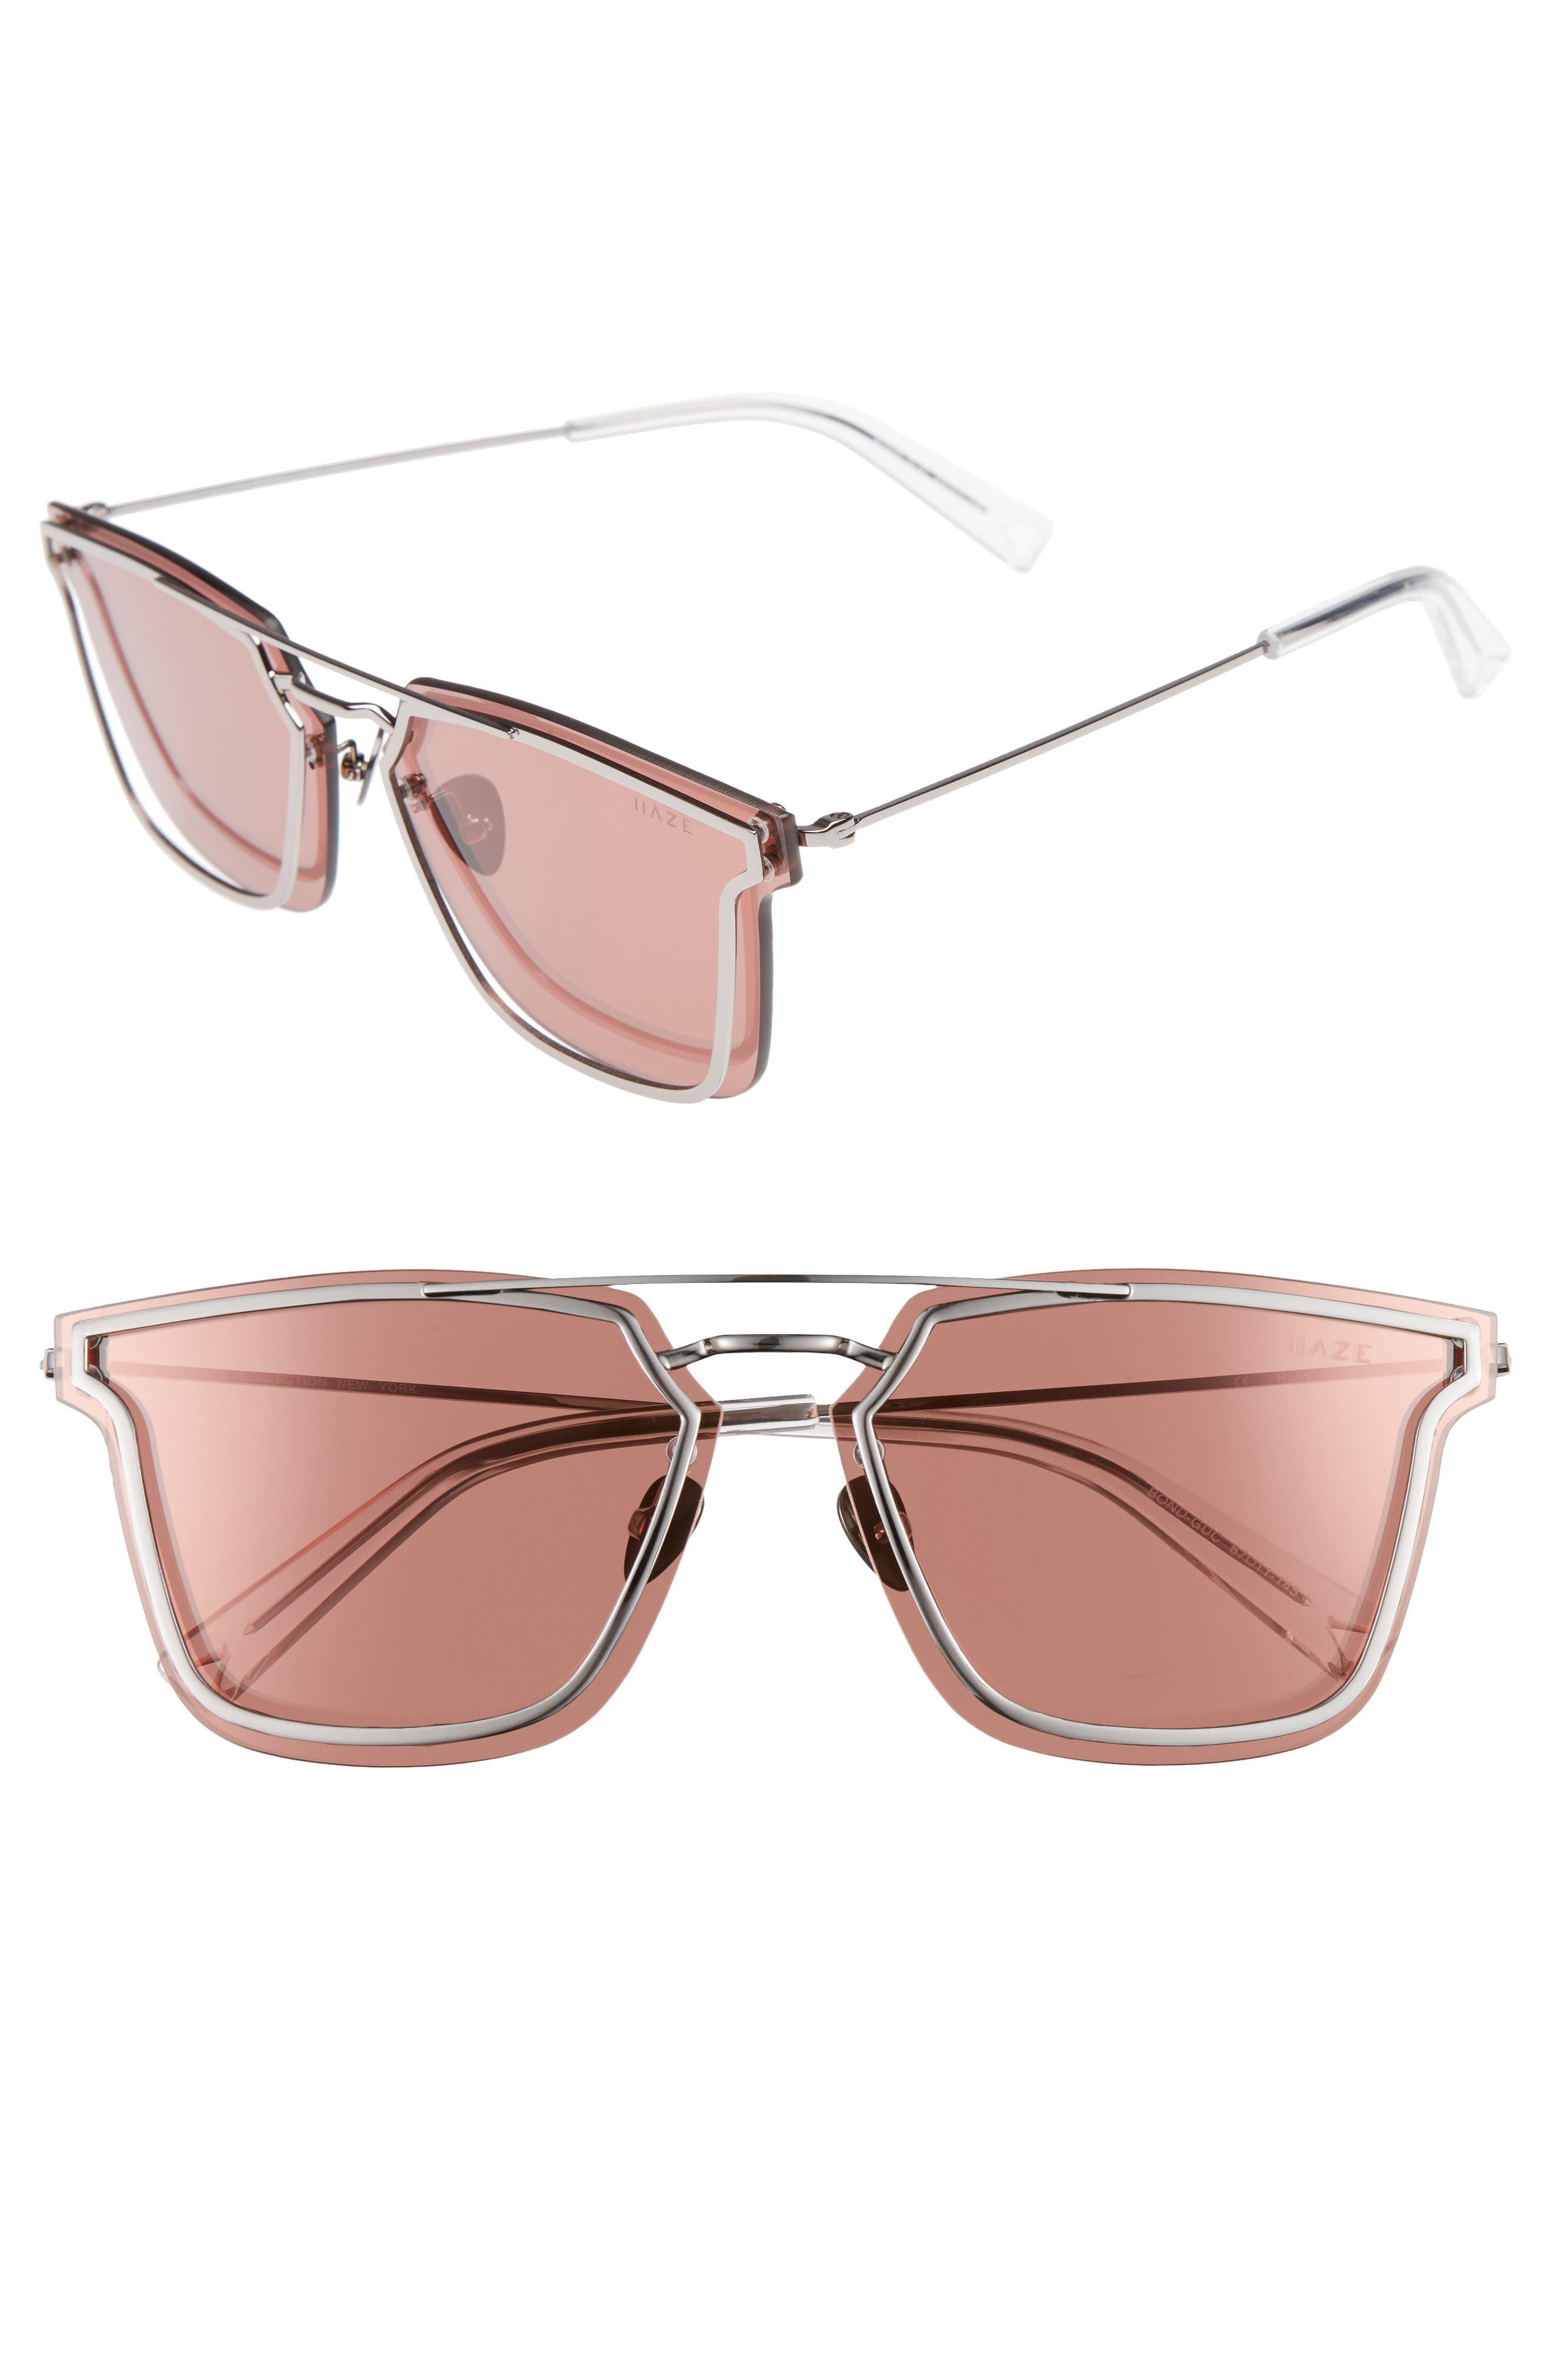 HAZE Bond 67mm Oversize Mirrored Sunglasses